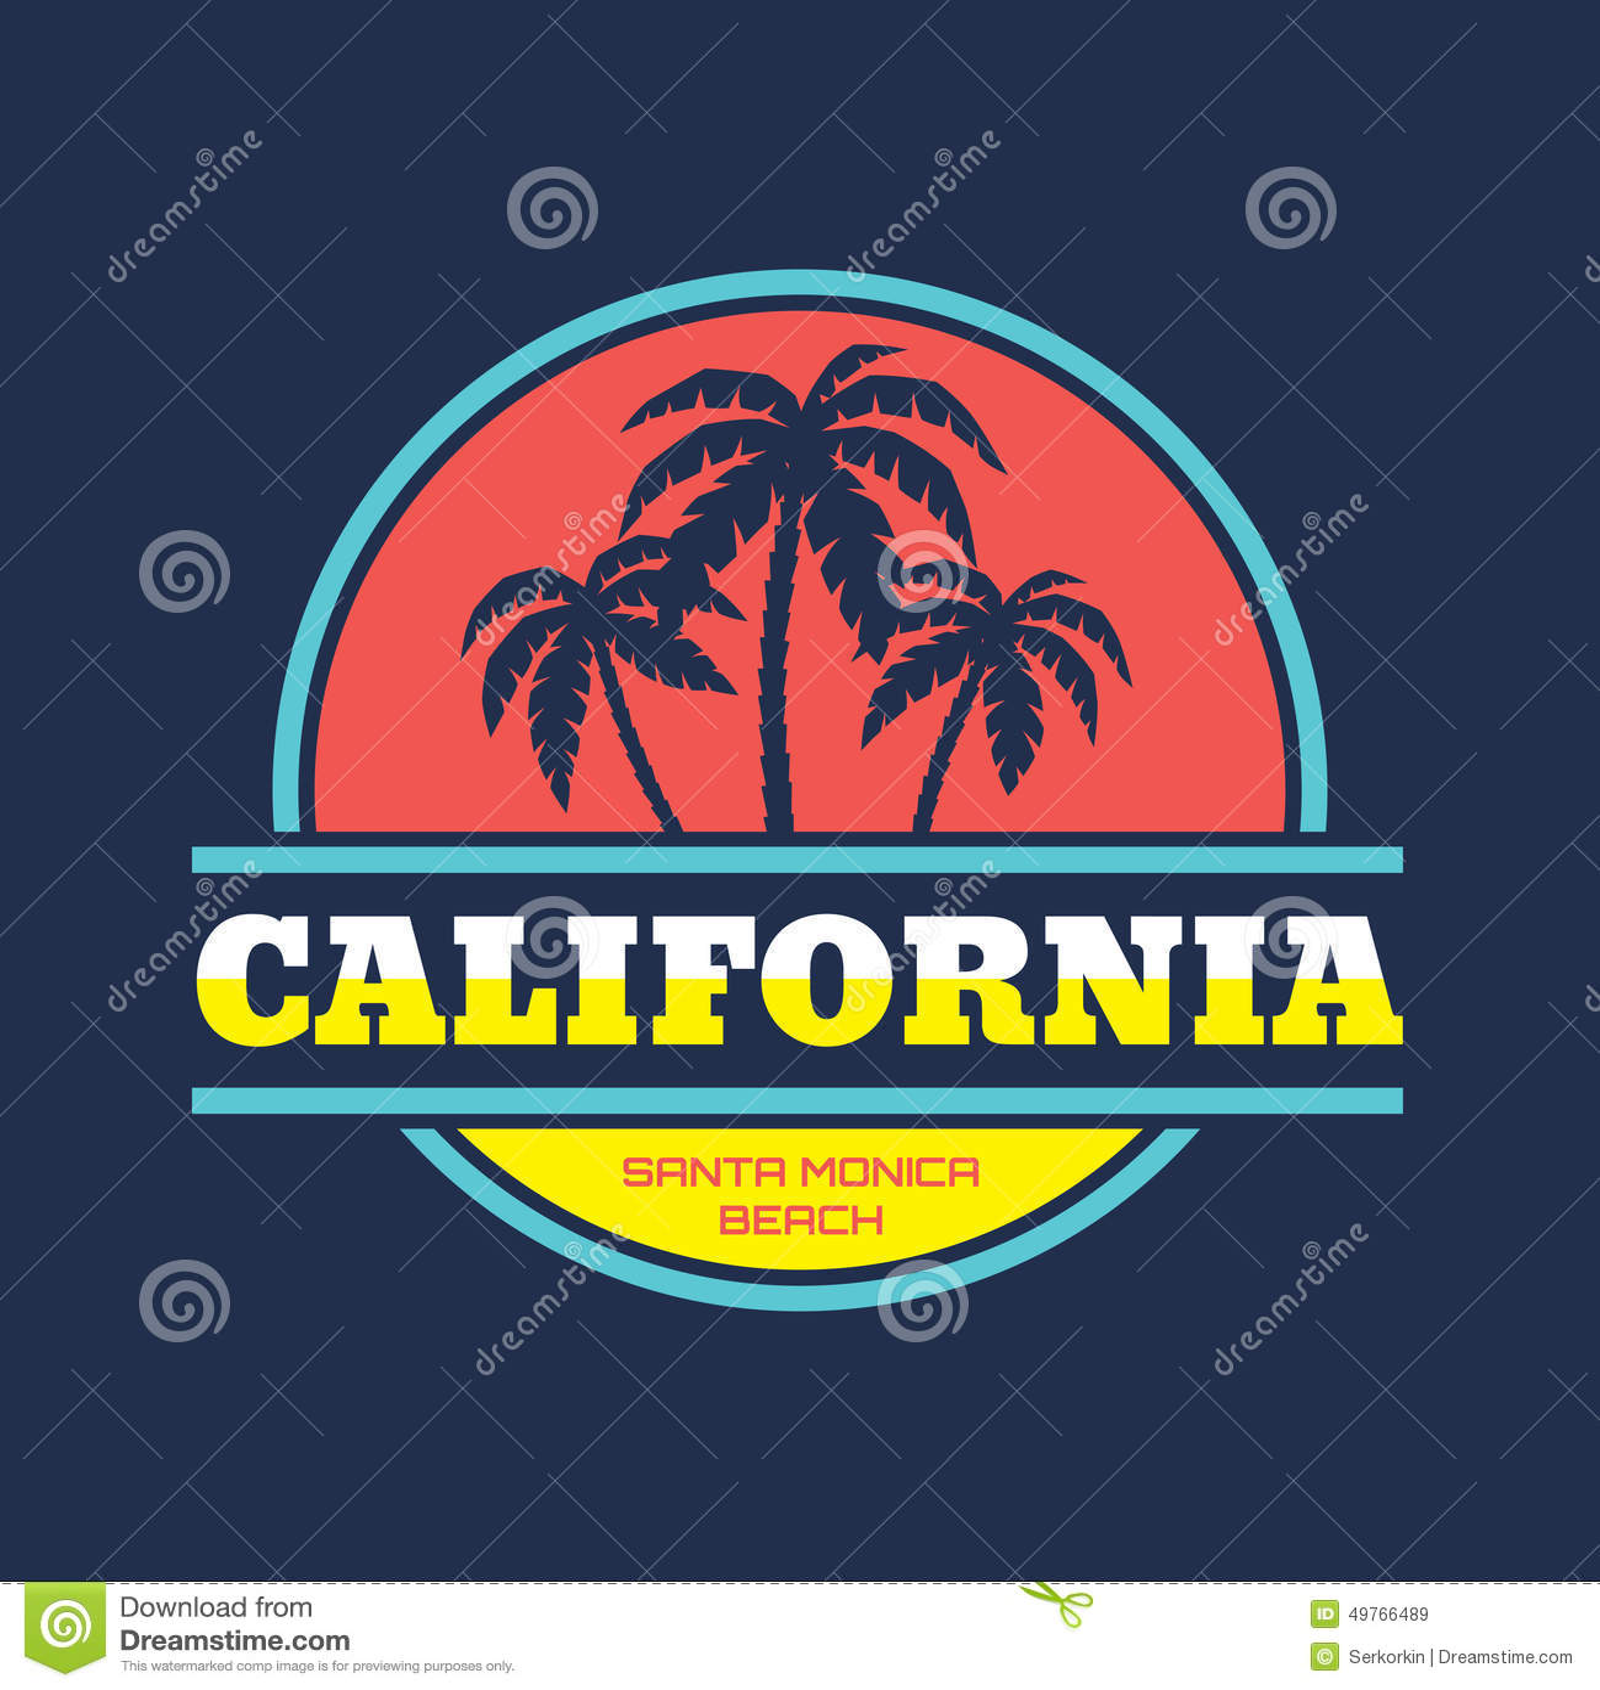 California santa monica beach vector illustration for Designers art of california